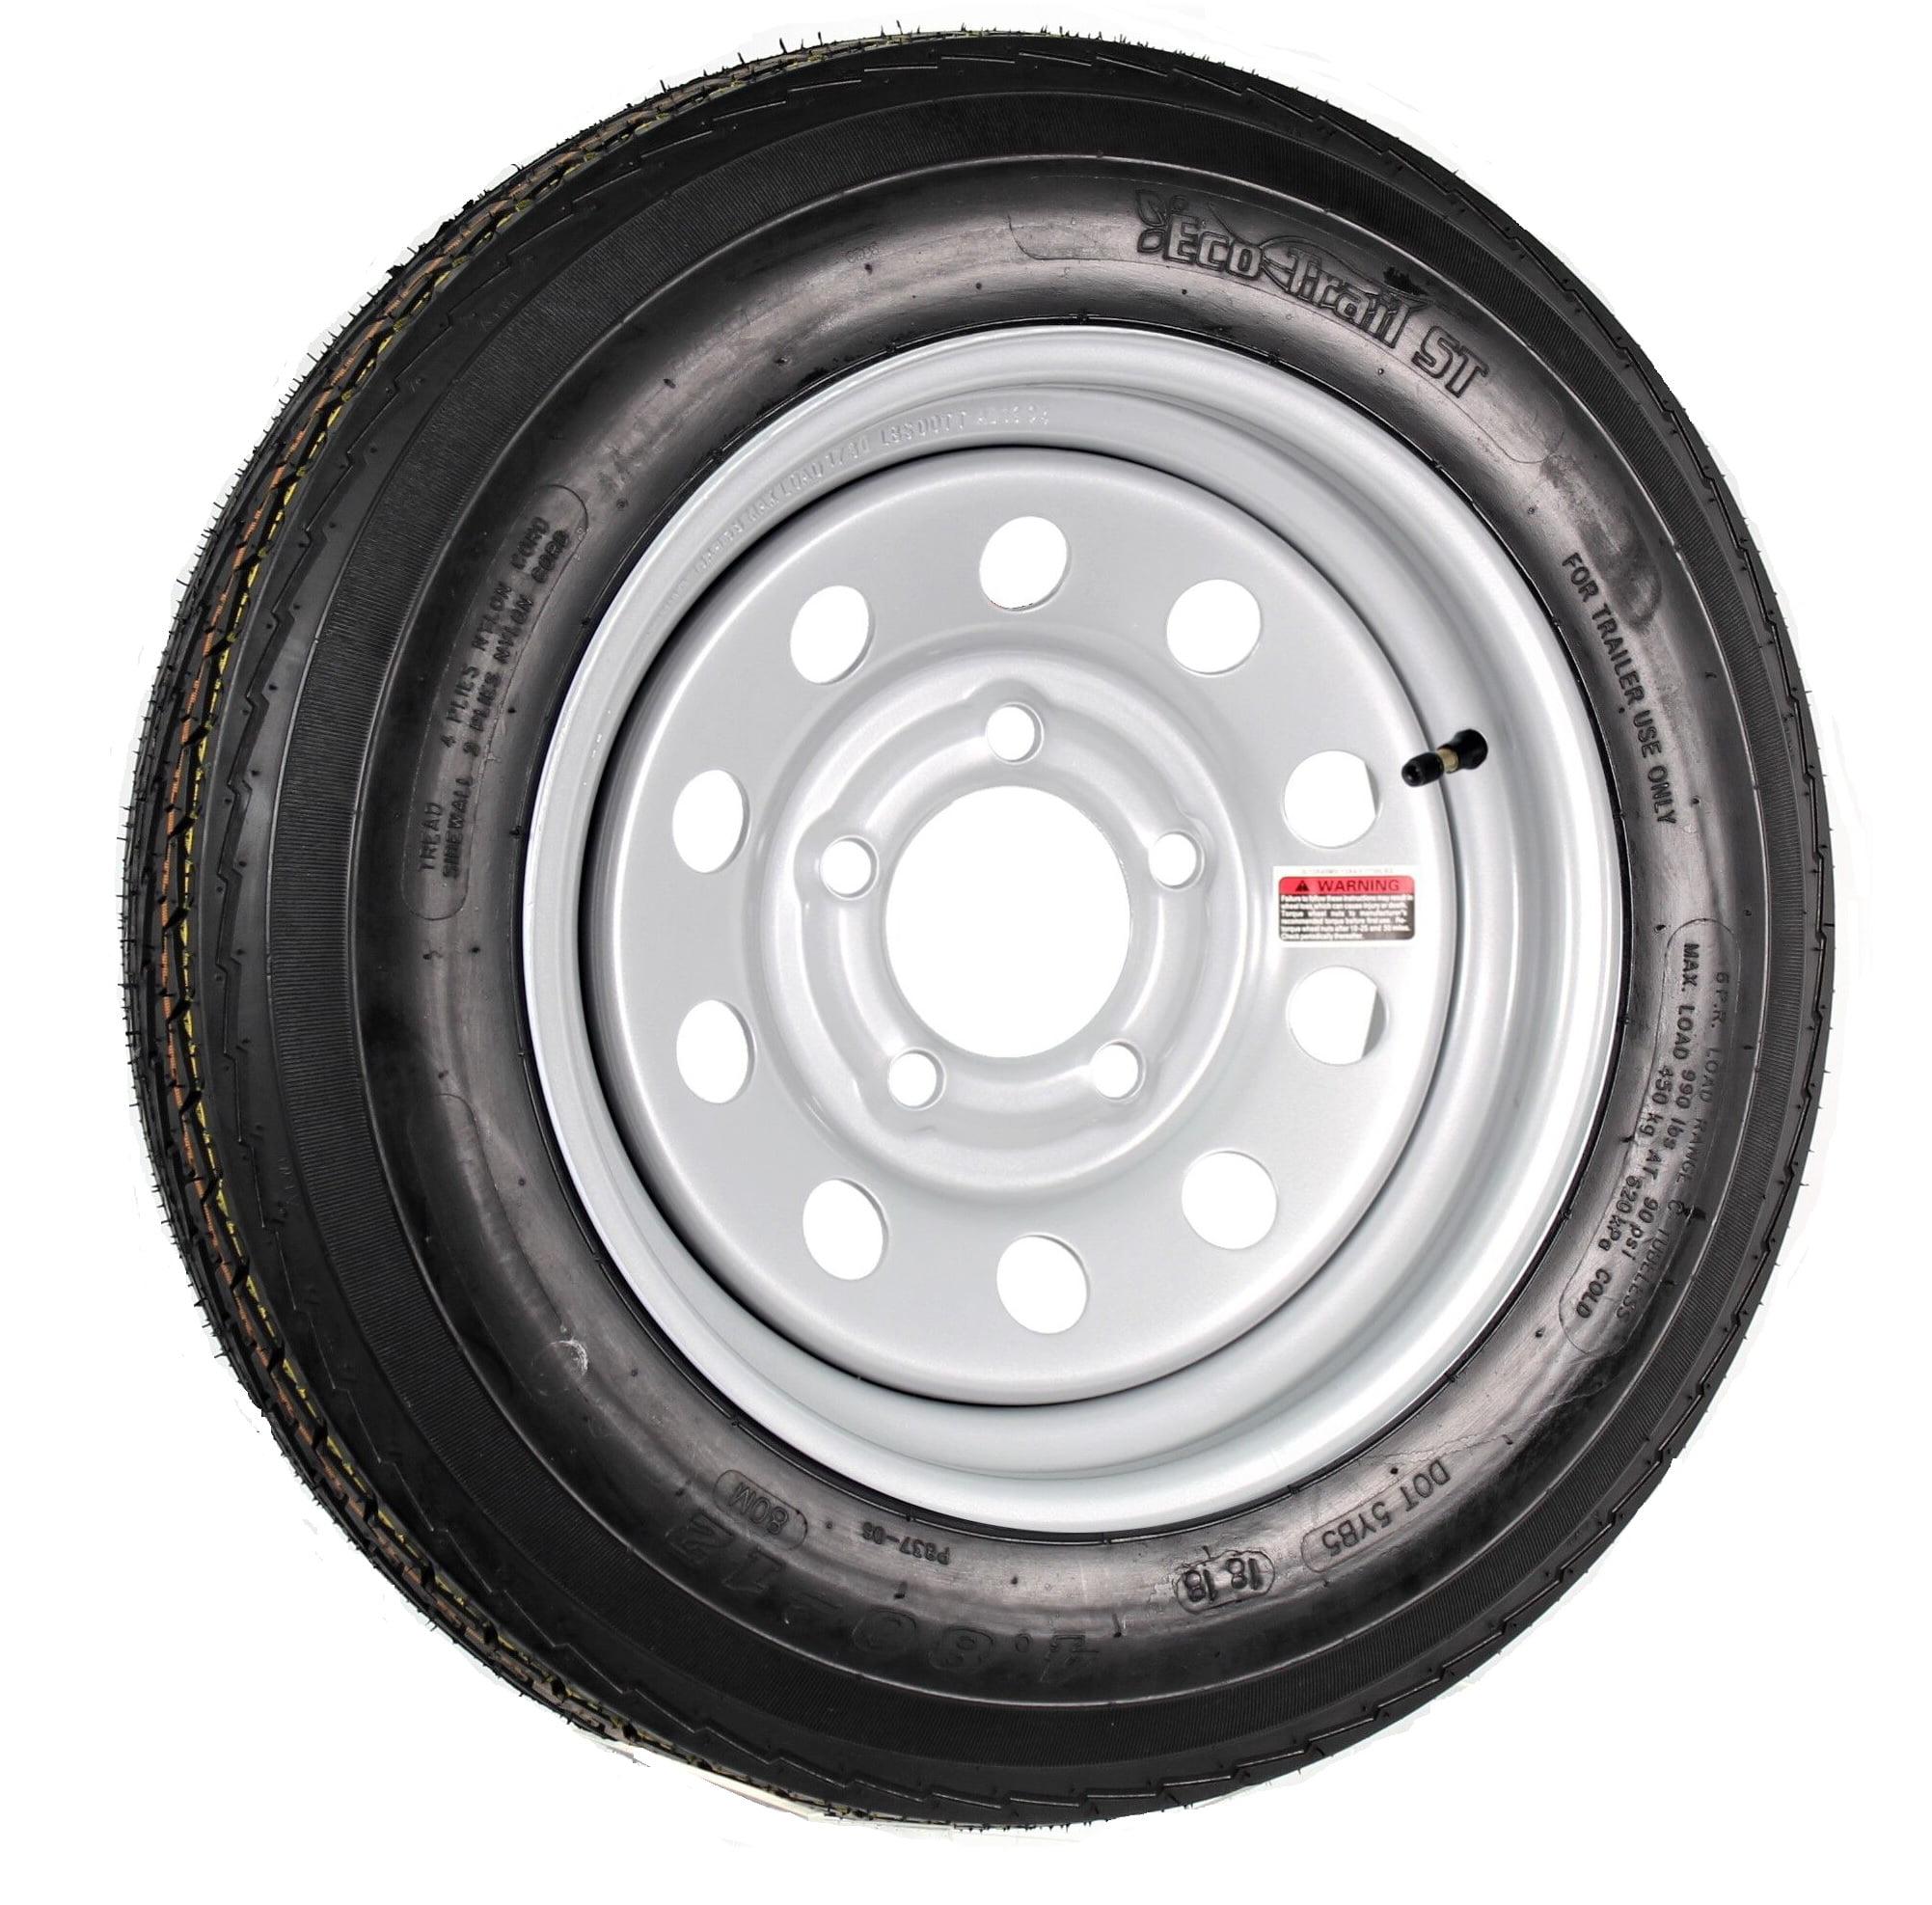 2-Pack Trailer Tire On Rim 480-12 4.80-12 480X12 Load B 5 Lug Silver Modular